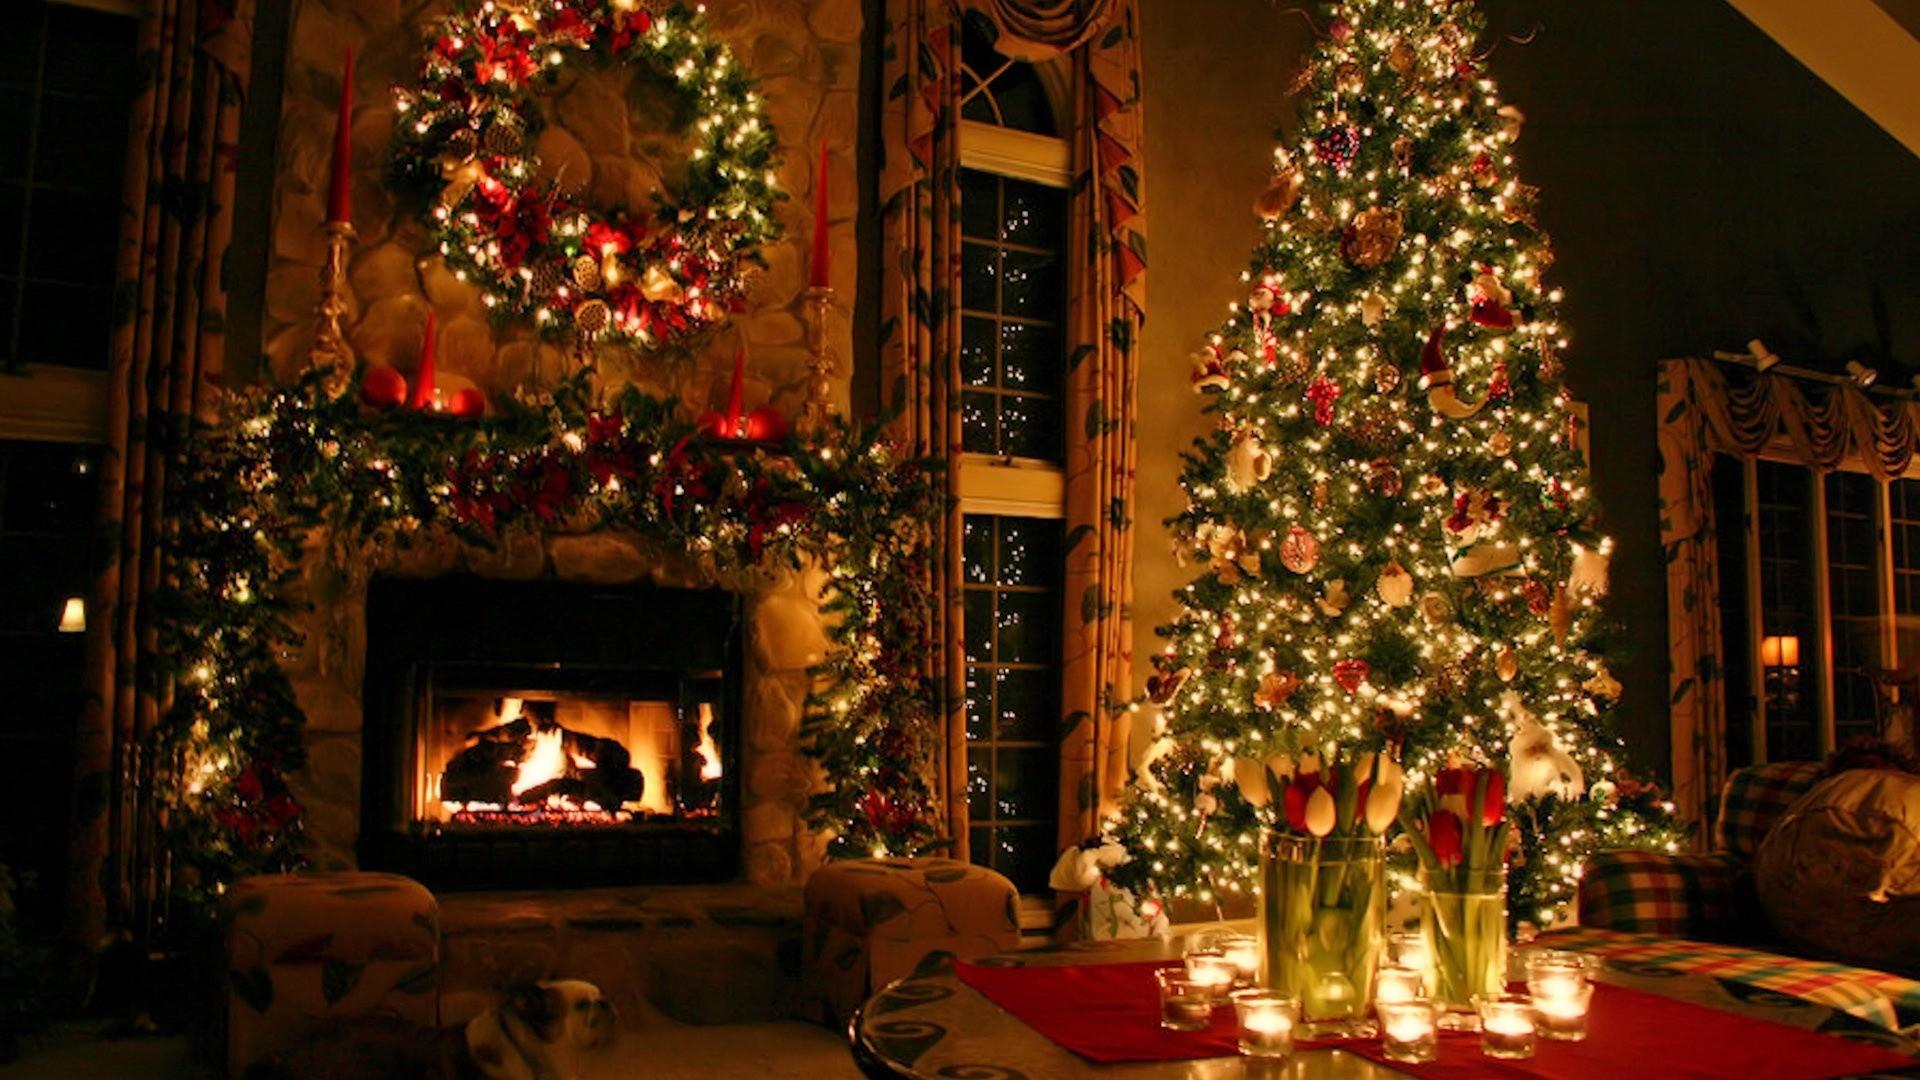 63 Computer Christmas Wallpapers on WallpaperPlay 1920x1080